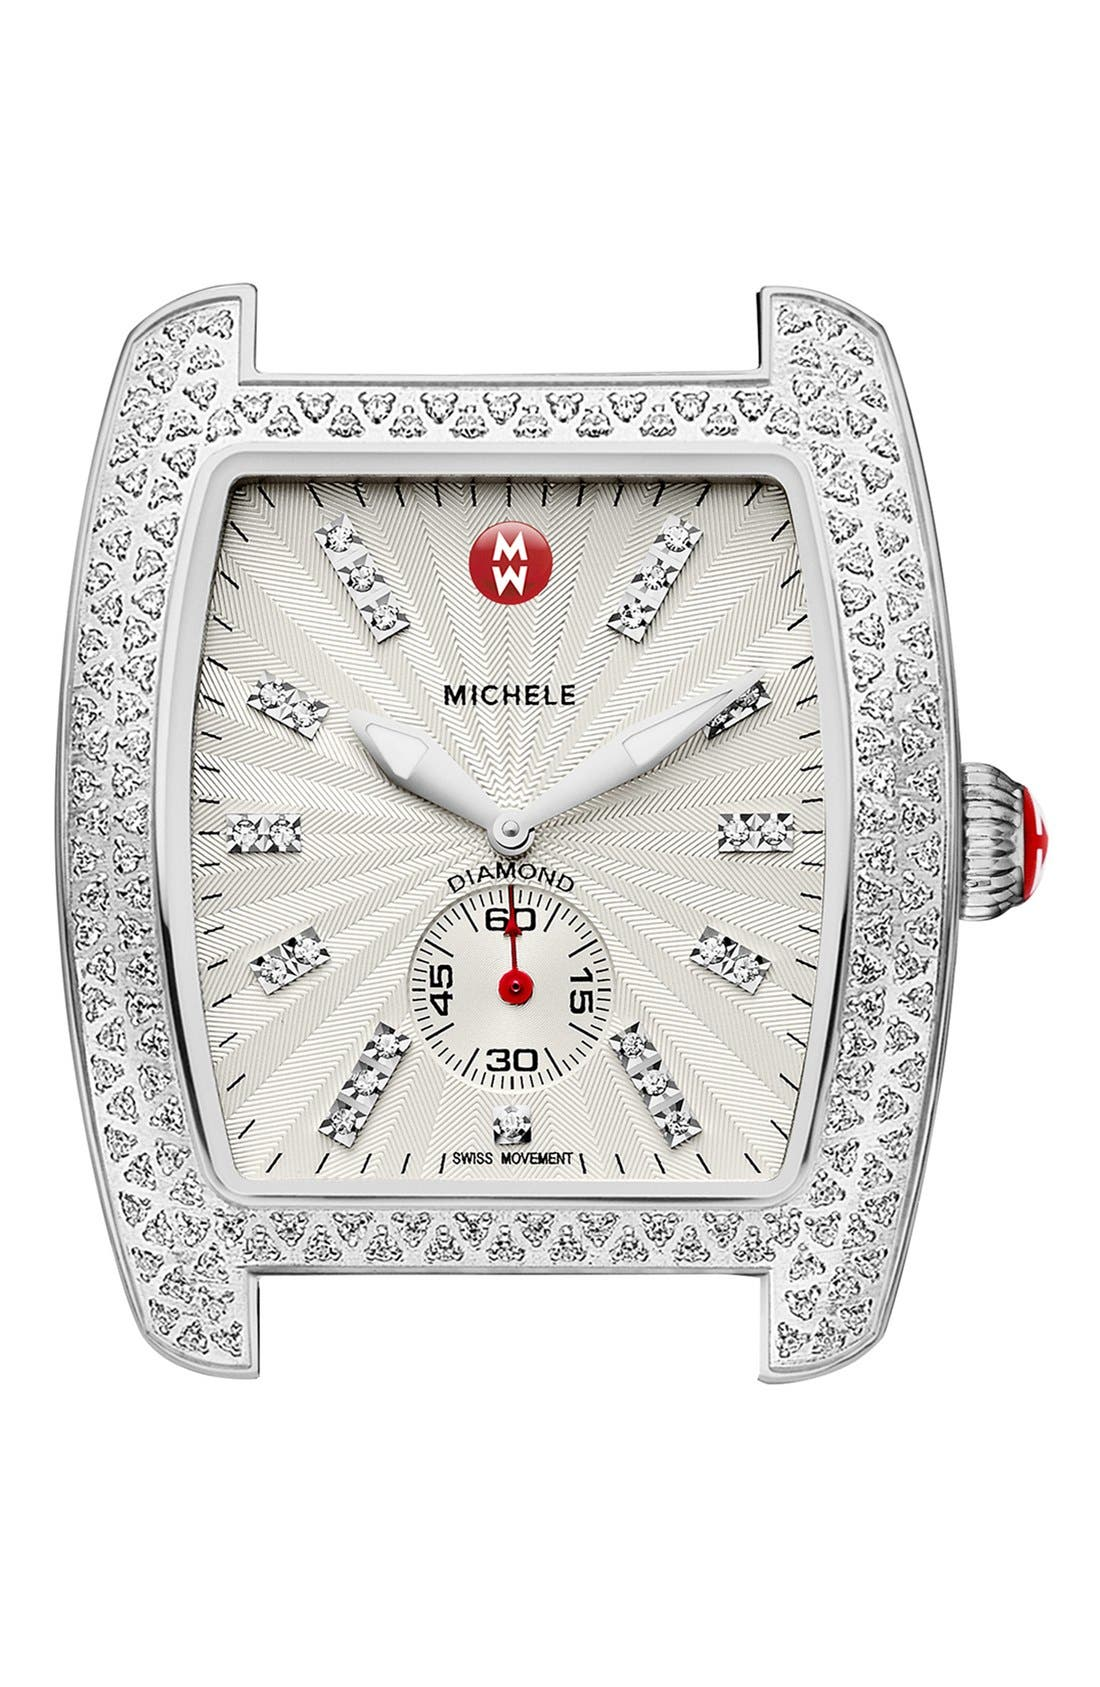 Alternate Image 1 Selected - MICHELE 'Urban Diamond' Diamond Dial Watch Case, 36mm x 37mm